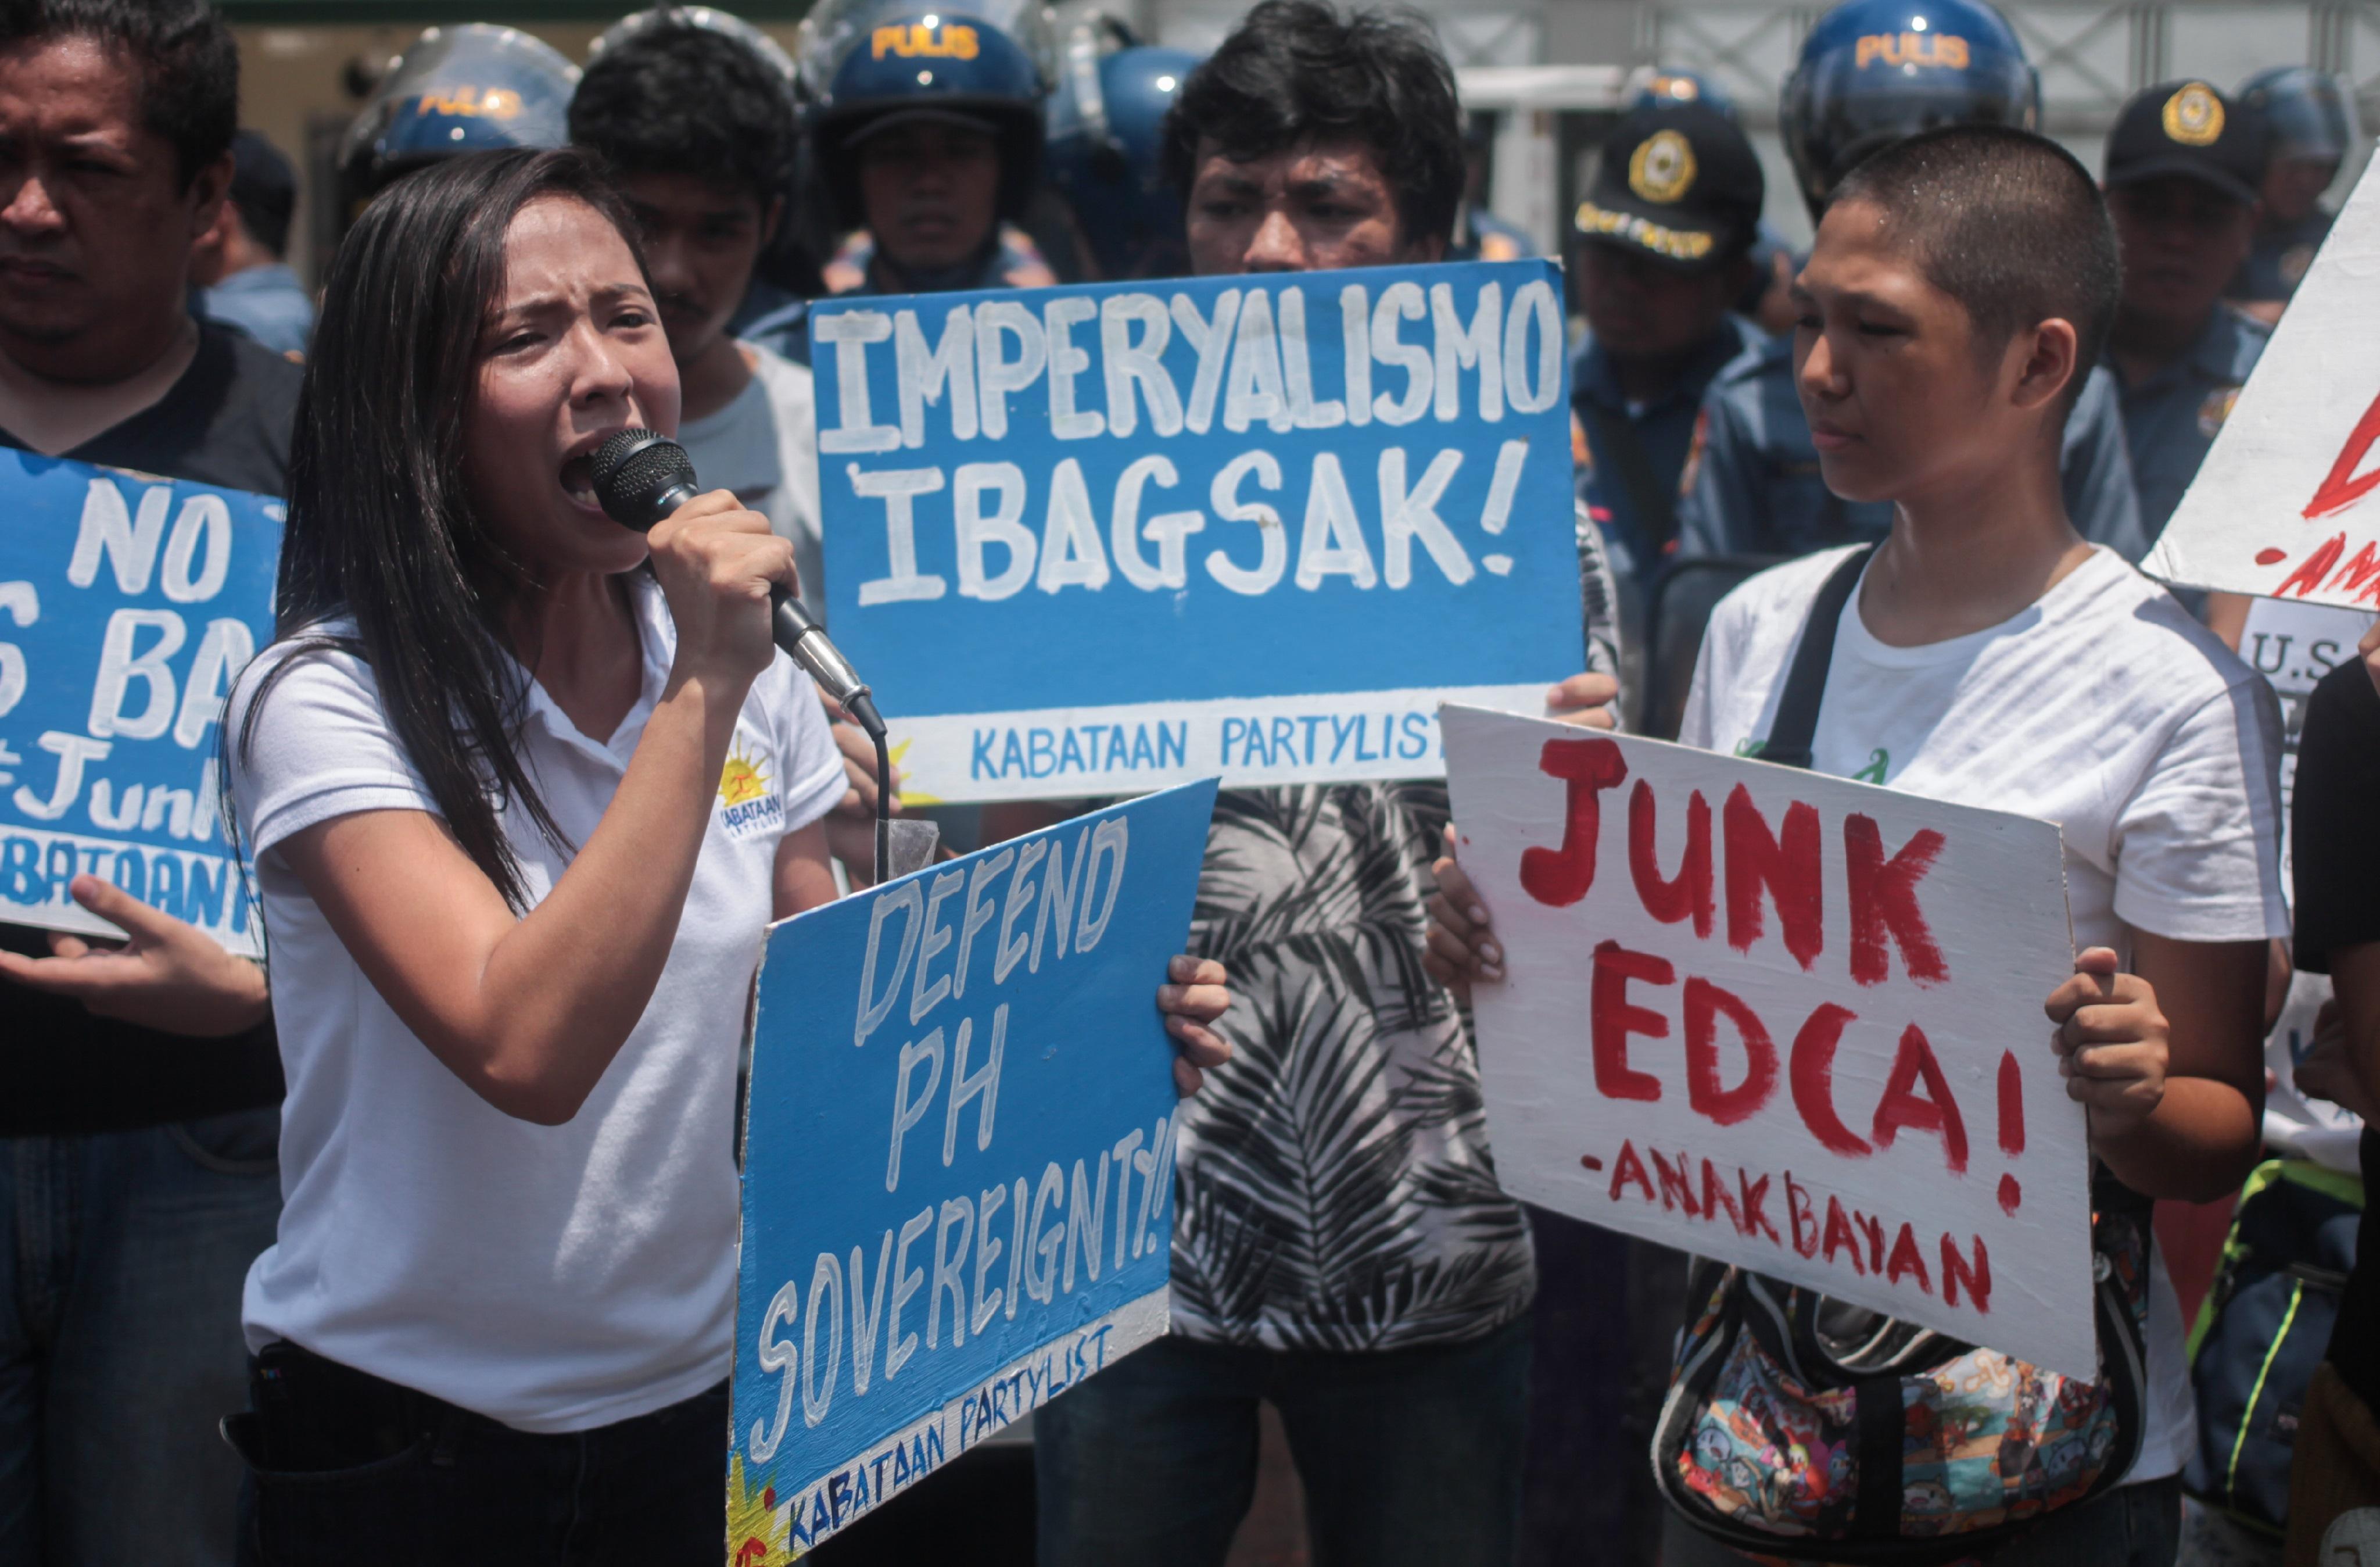 (Photo by G. Estella/Bulatlat)